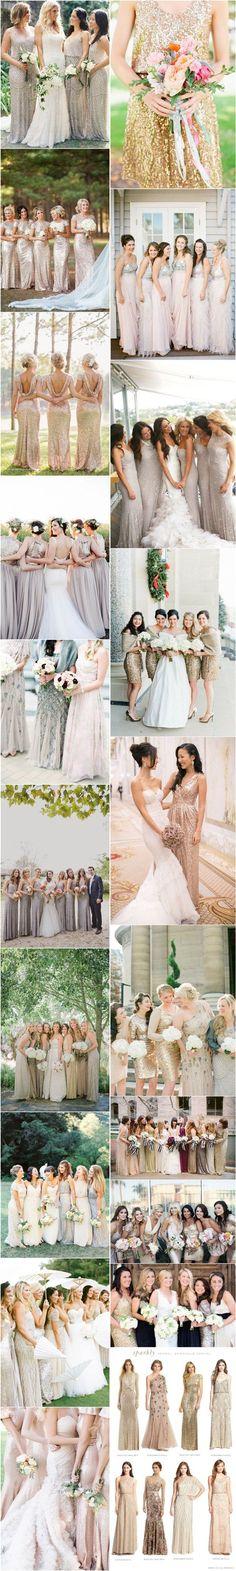 ¡Hermosa #tendencia en #bodas para este año! #Wedding #Trends #Ideas